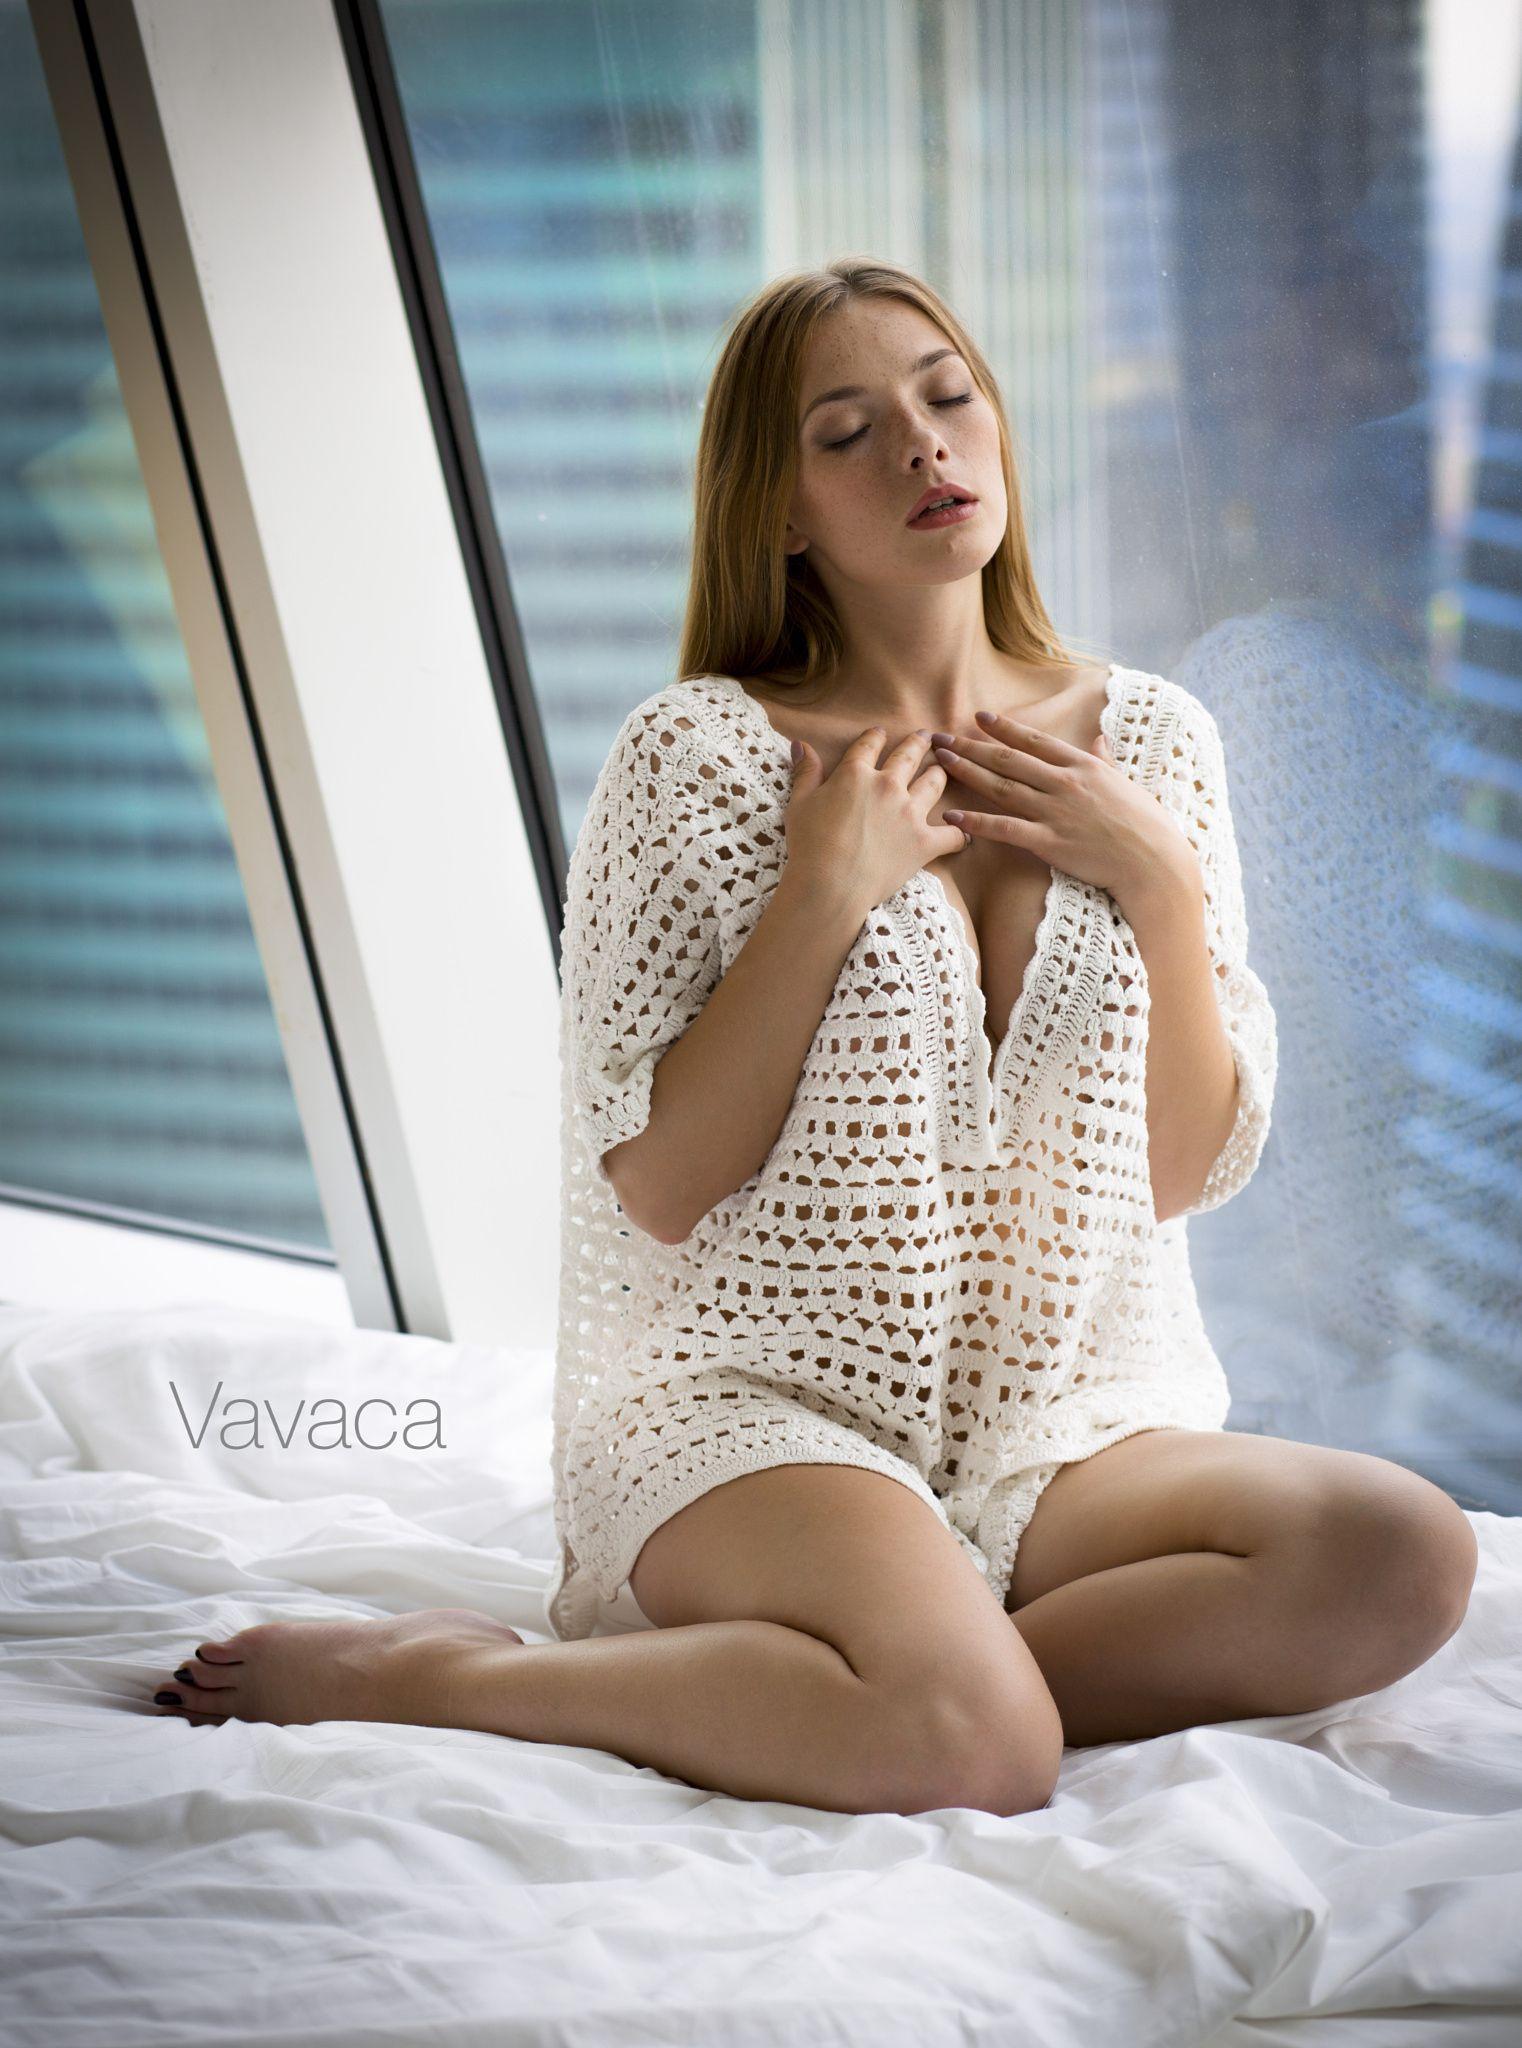 Cleavage Olga Kobzar nude photos 2019